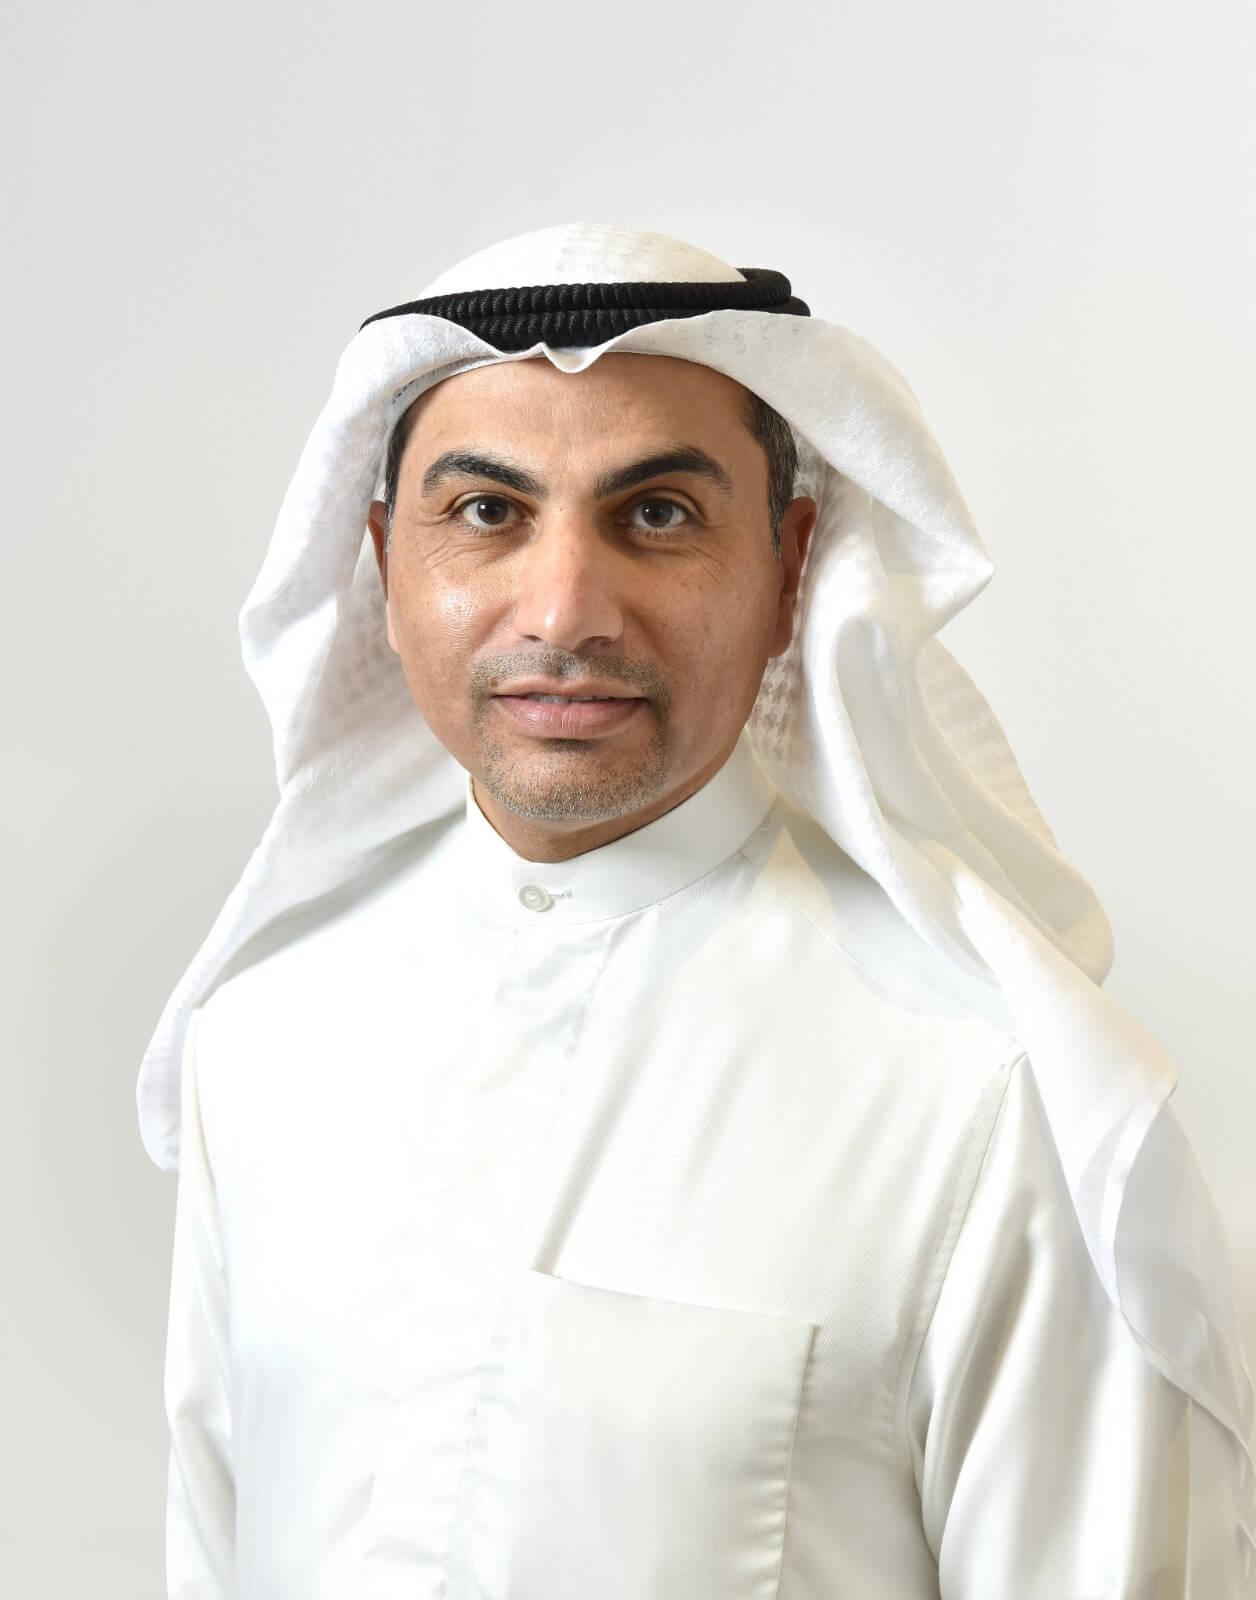 Mohammad Al-Salem